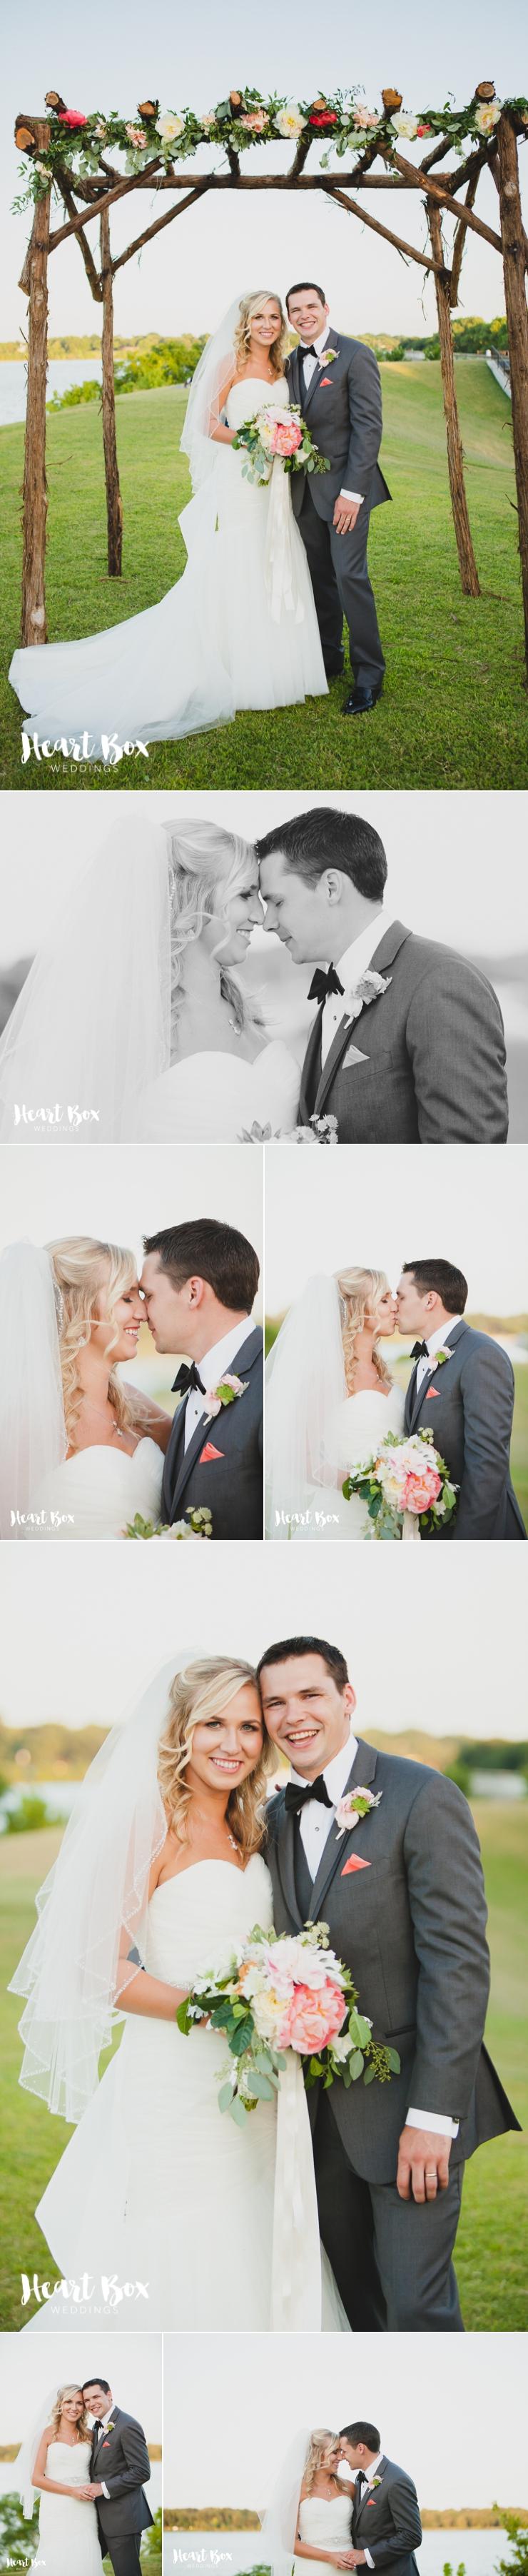 Gould Wedding Blog Collages 16.jpg